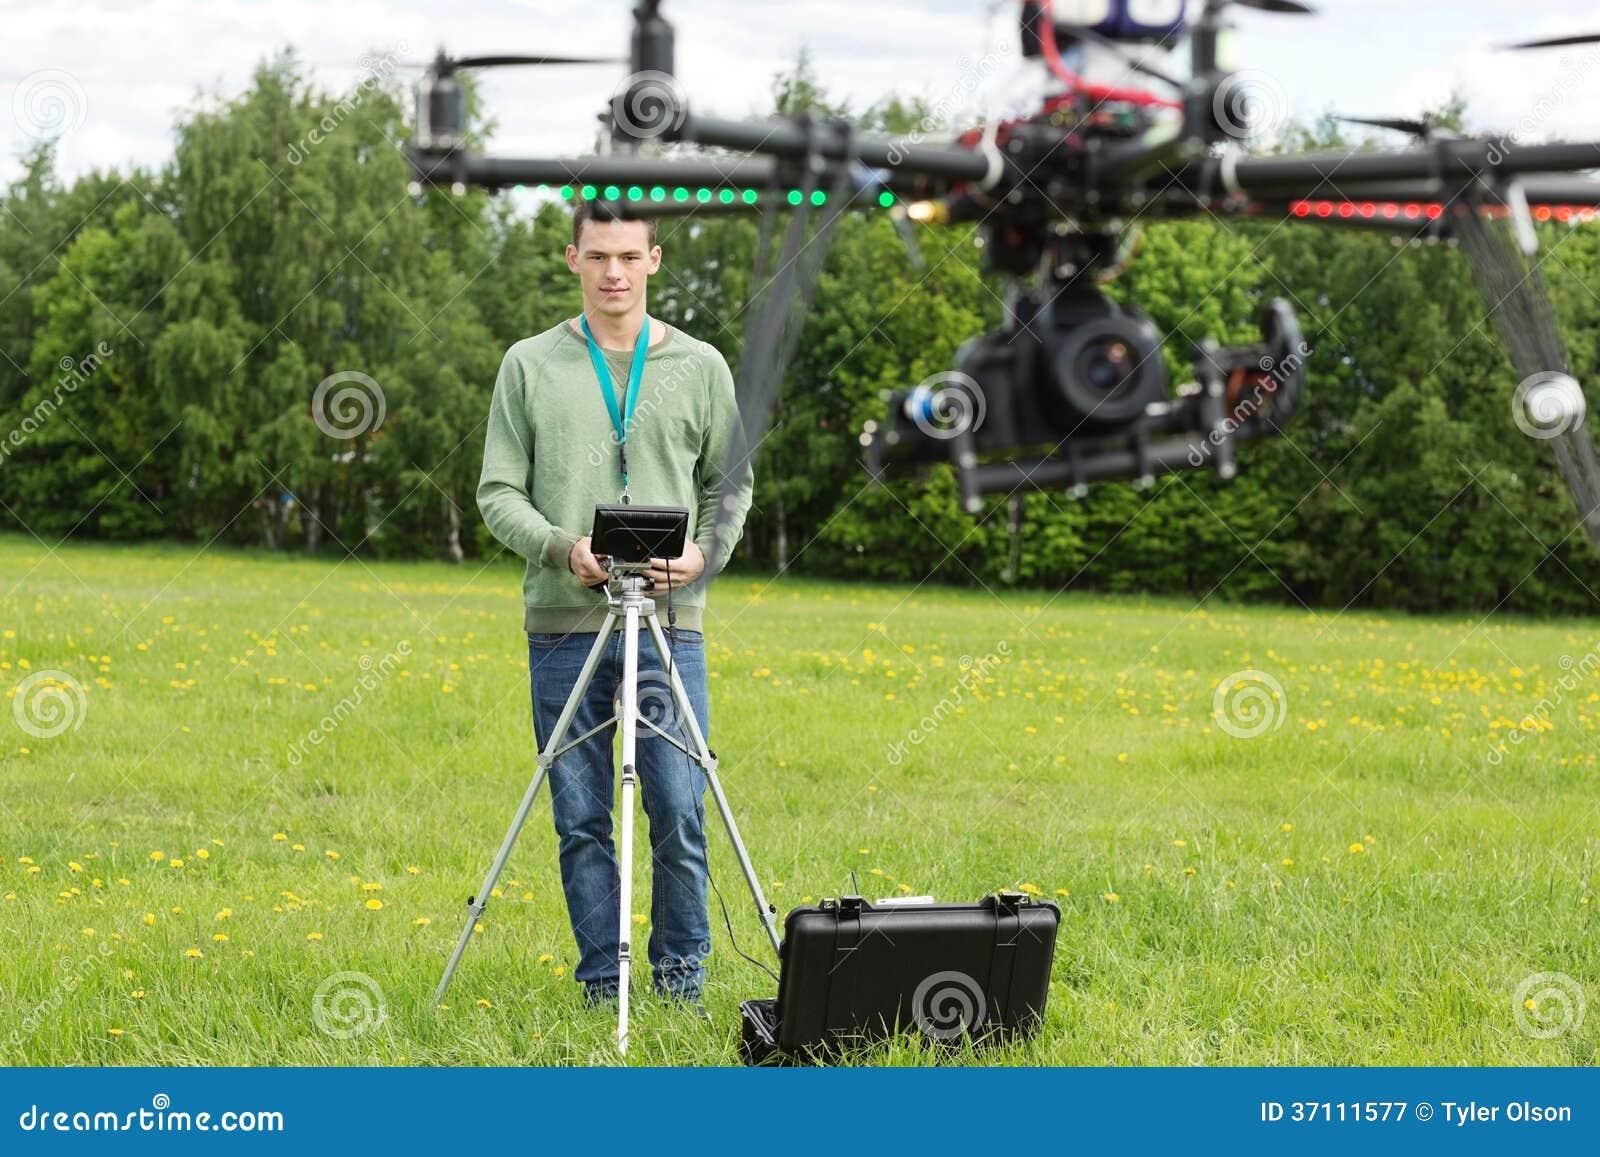 Technician Flying UAV Helicopter